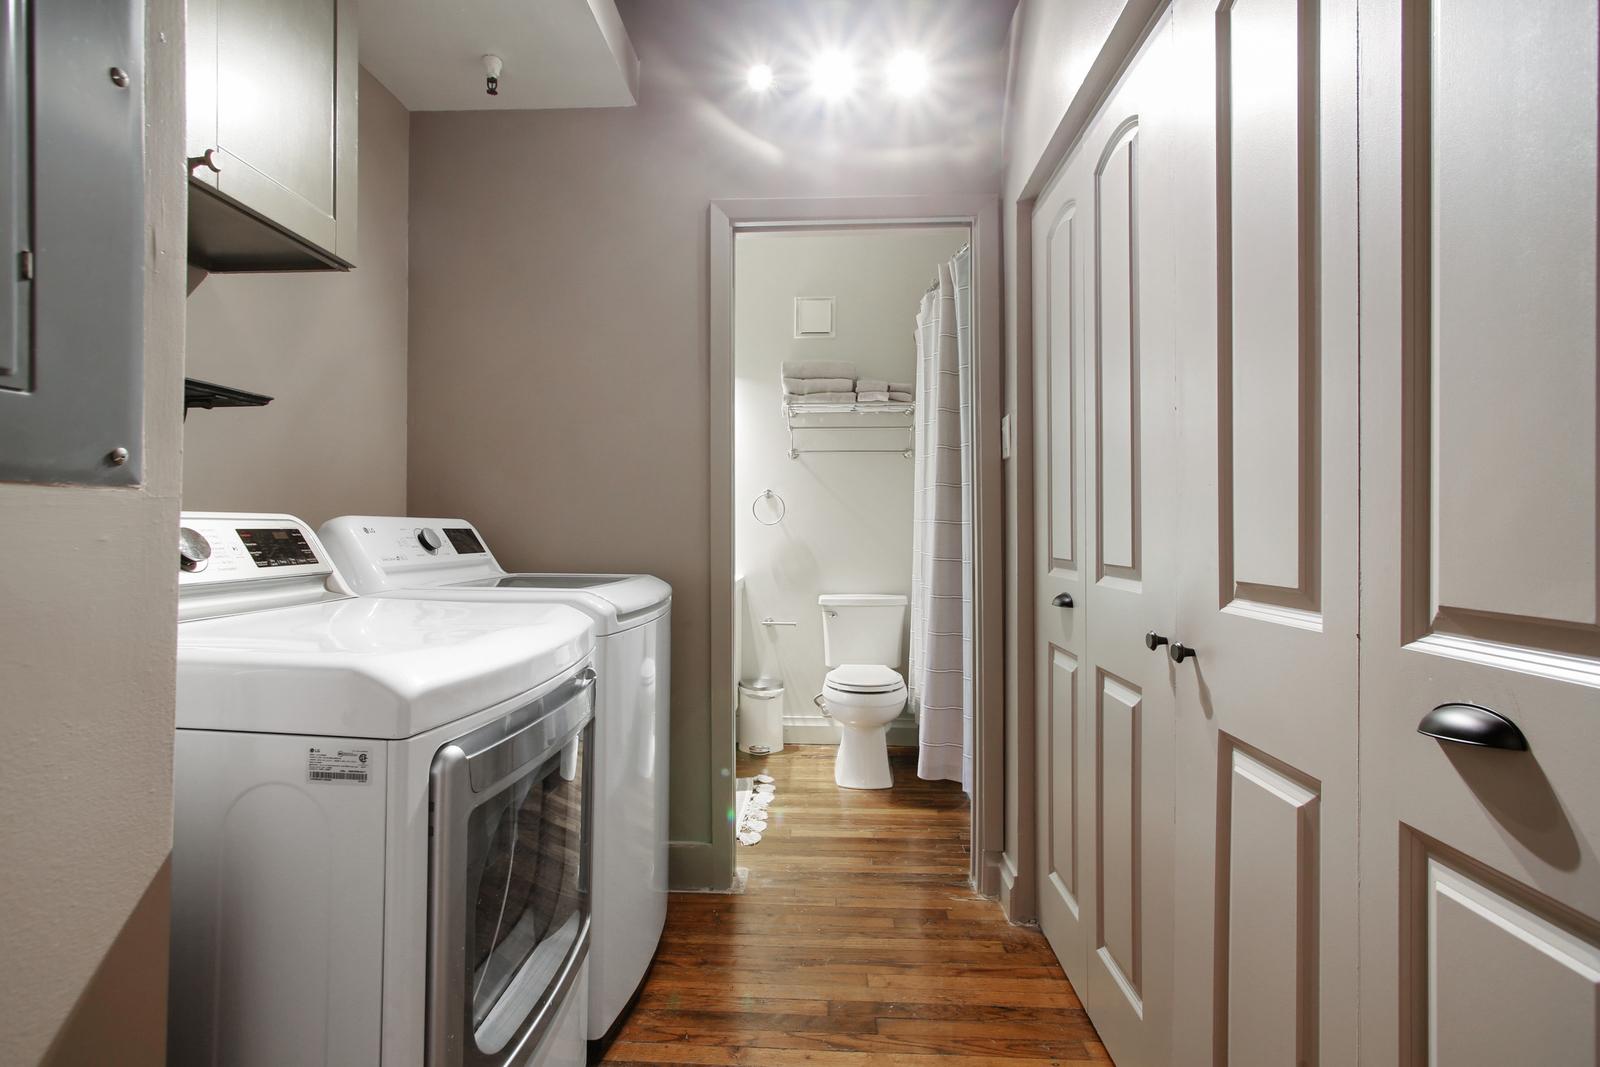 CBD/Warehouse District/South Market, Condo, 1 beds, 1.0 baths, $2800 per month New Orleans Rental - devie image_11